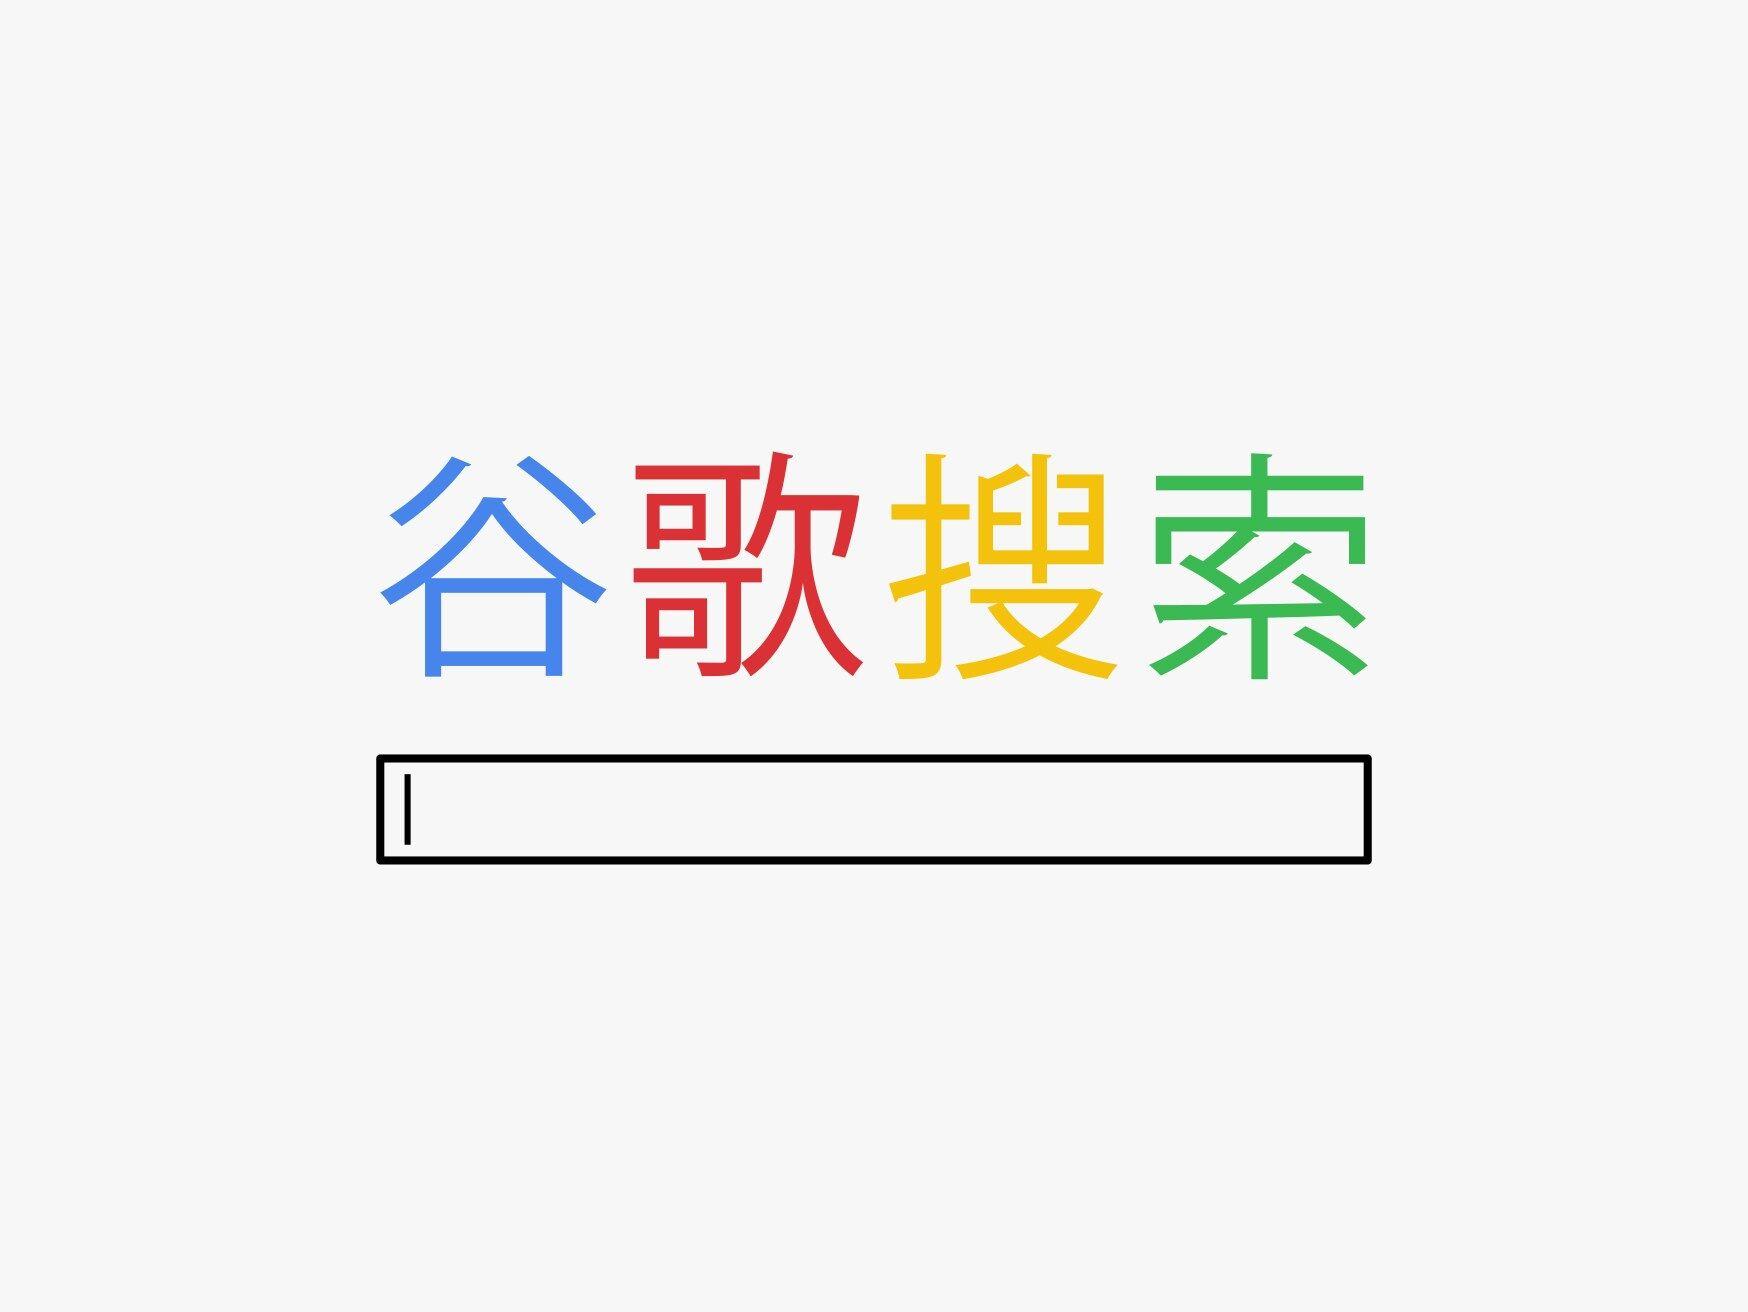 Google 在搜索结果上存在人为干预;AI 大牛贾佳亚告别腾讯优图;WeWork计划裁员至少4000人 | Q资讯